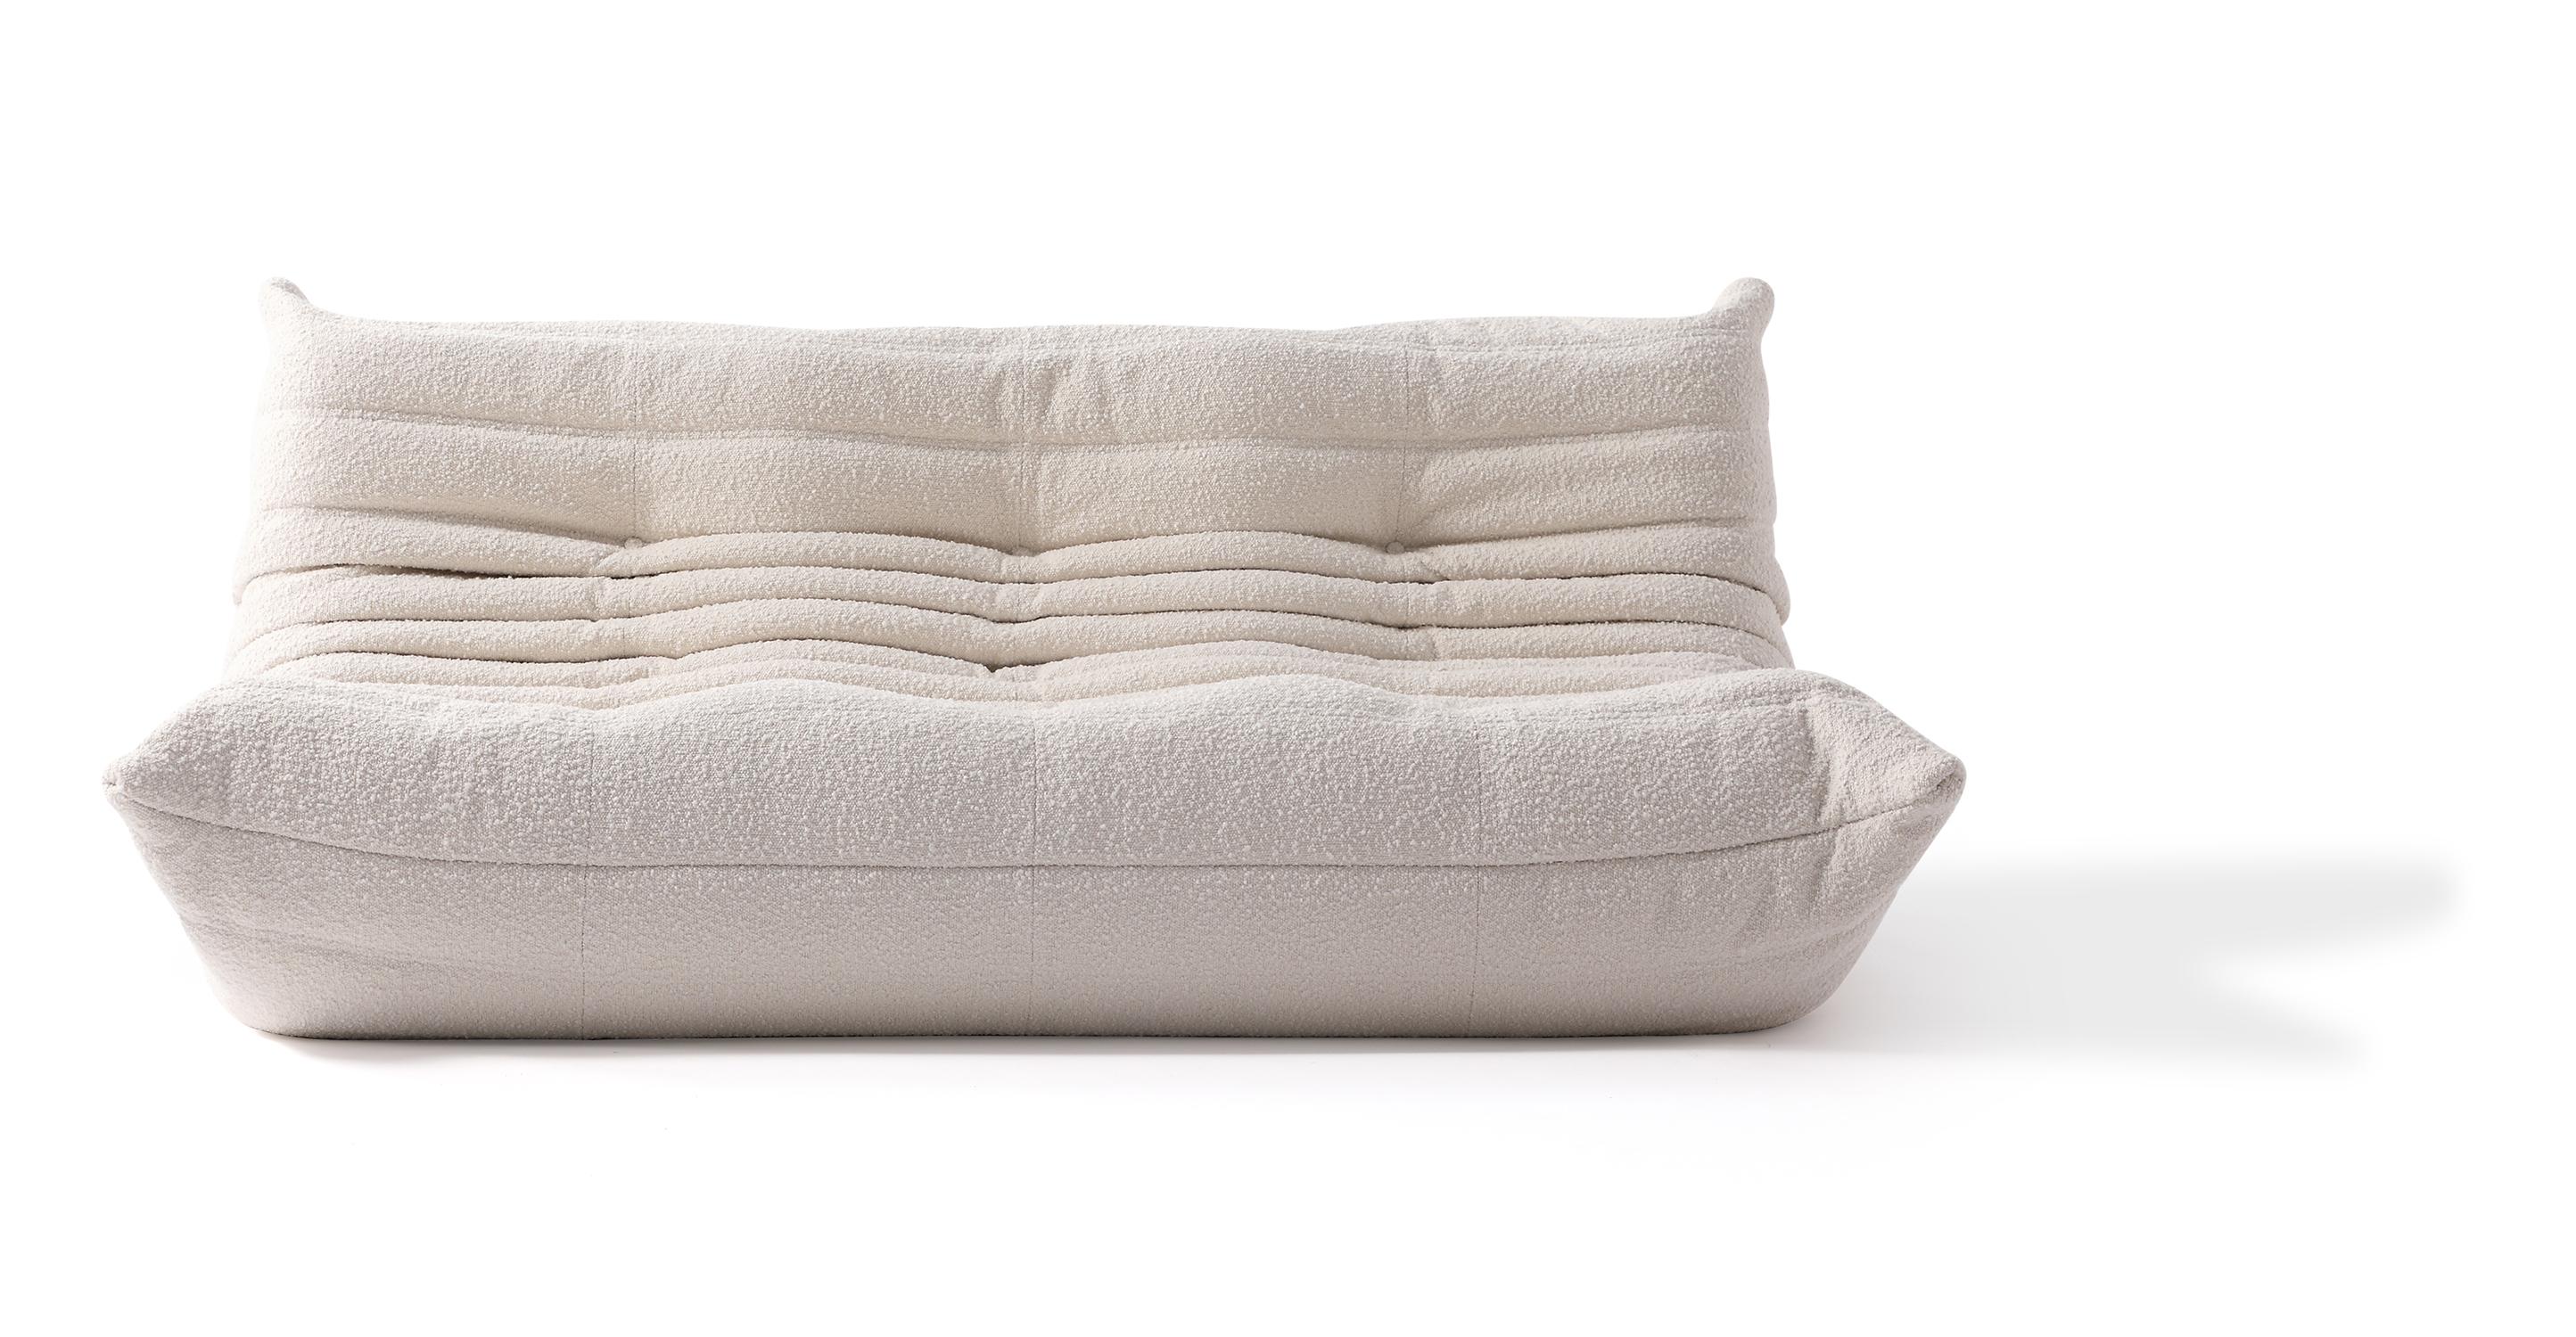 "Louvre 70"" Fabric 3-Seat Sofa, Blanc Boucle"